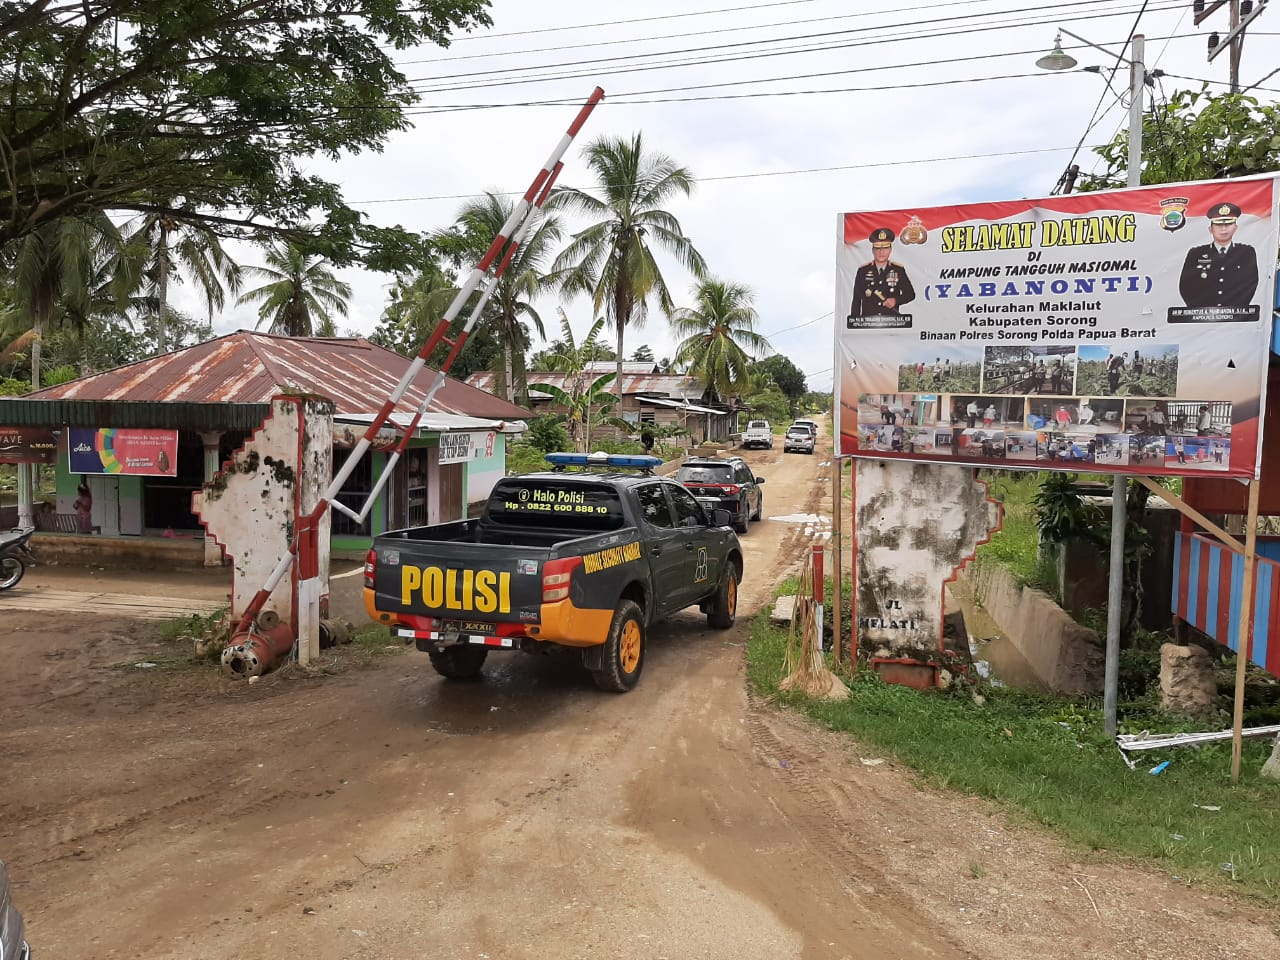 Karo Ops dan Dir Binmas Polda Papua Barat Tinjau Kampung Tangguh Nasional di kelurahan Maklalut distrik Mariat